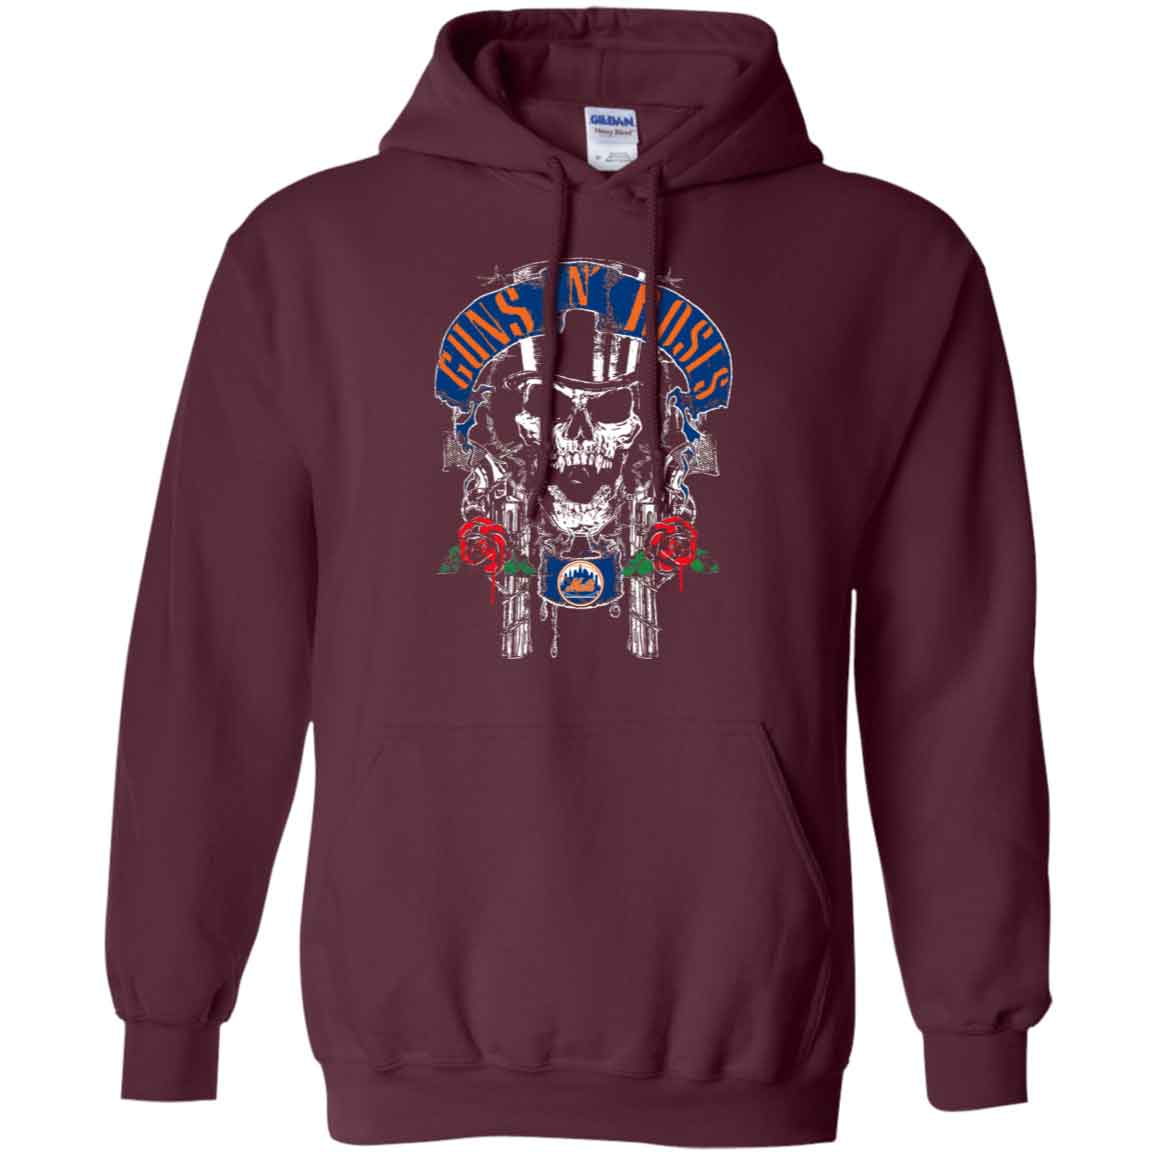 best service 38f36 713f1 Gún N Roses Iron Maiden New York Mets Hoodies Sweatshirts